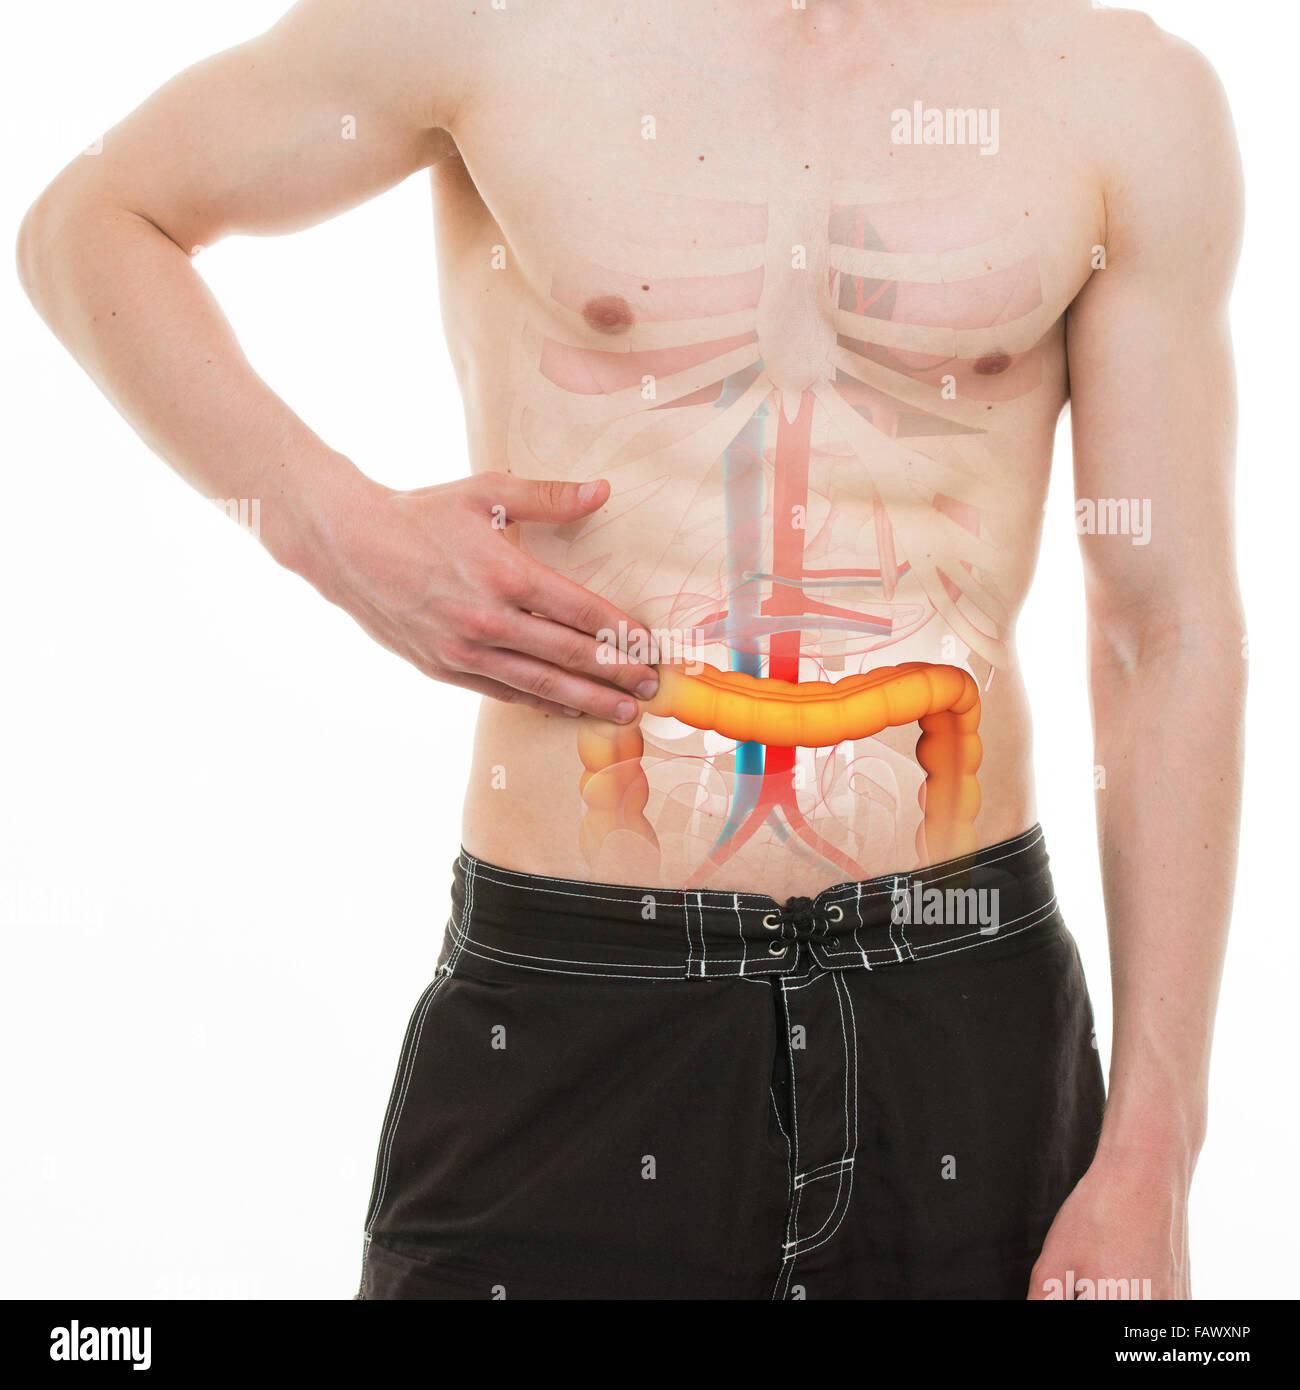 Abdominal Pain - Colon Intestine Right Side Pain - REAL Anatomy ...